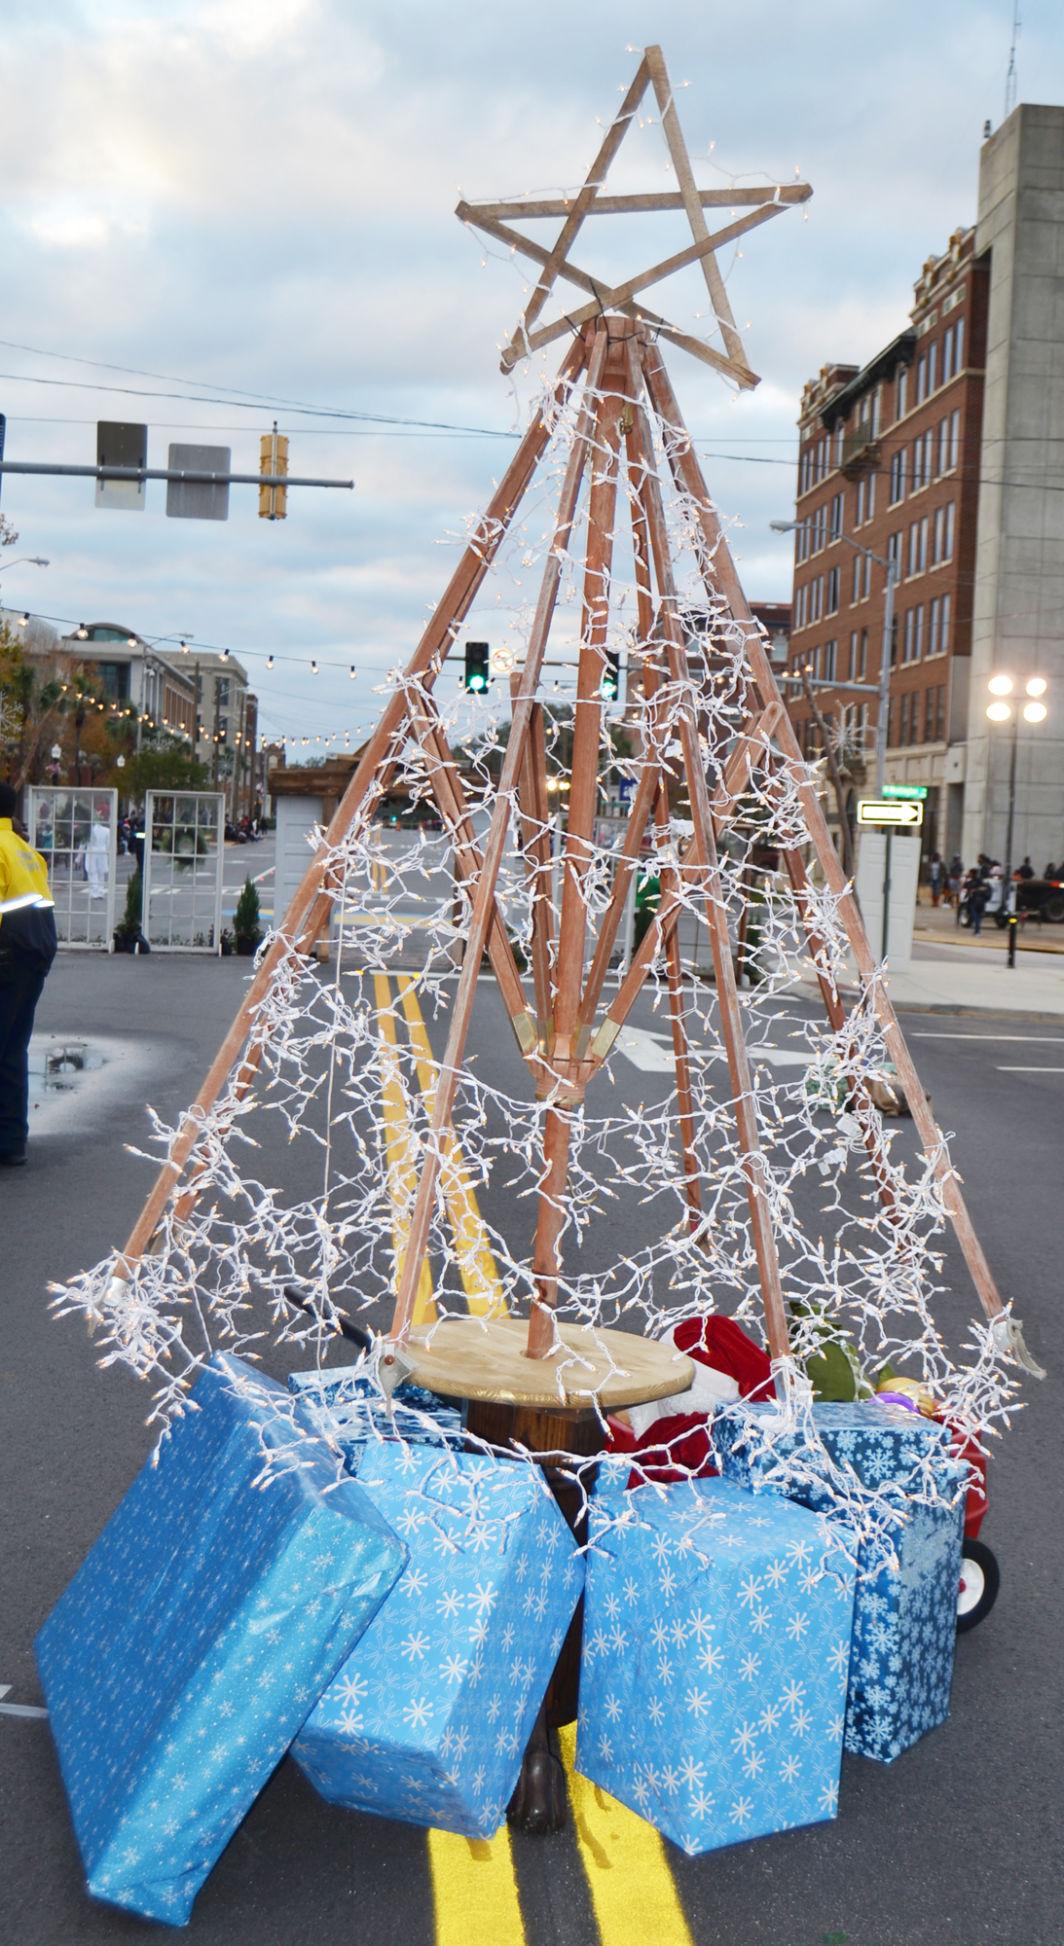 Southwest Georgia greets the holiday season